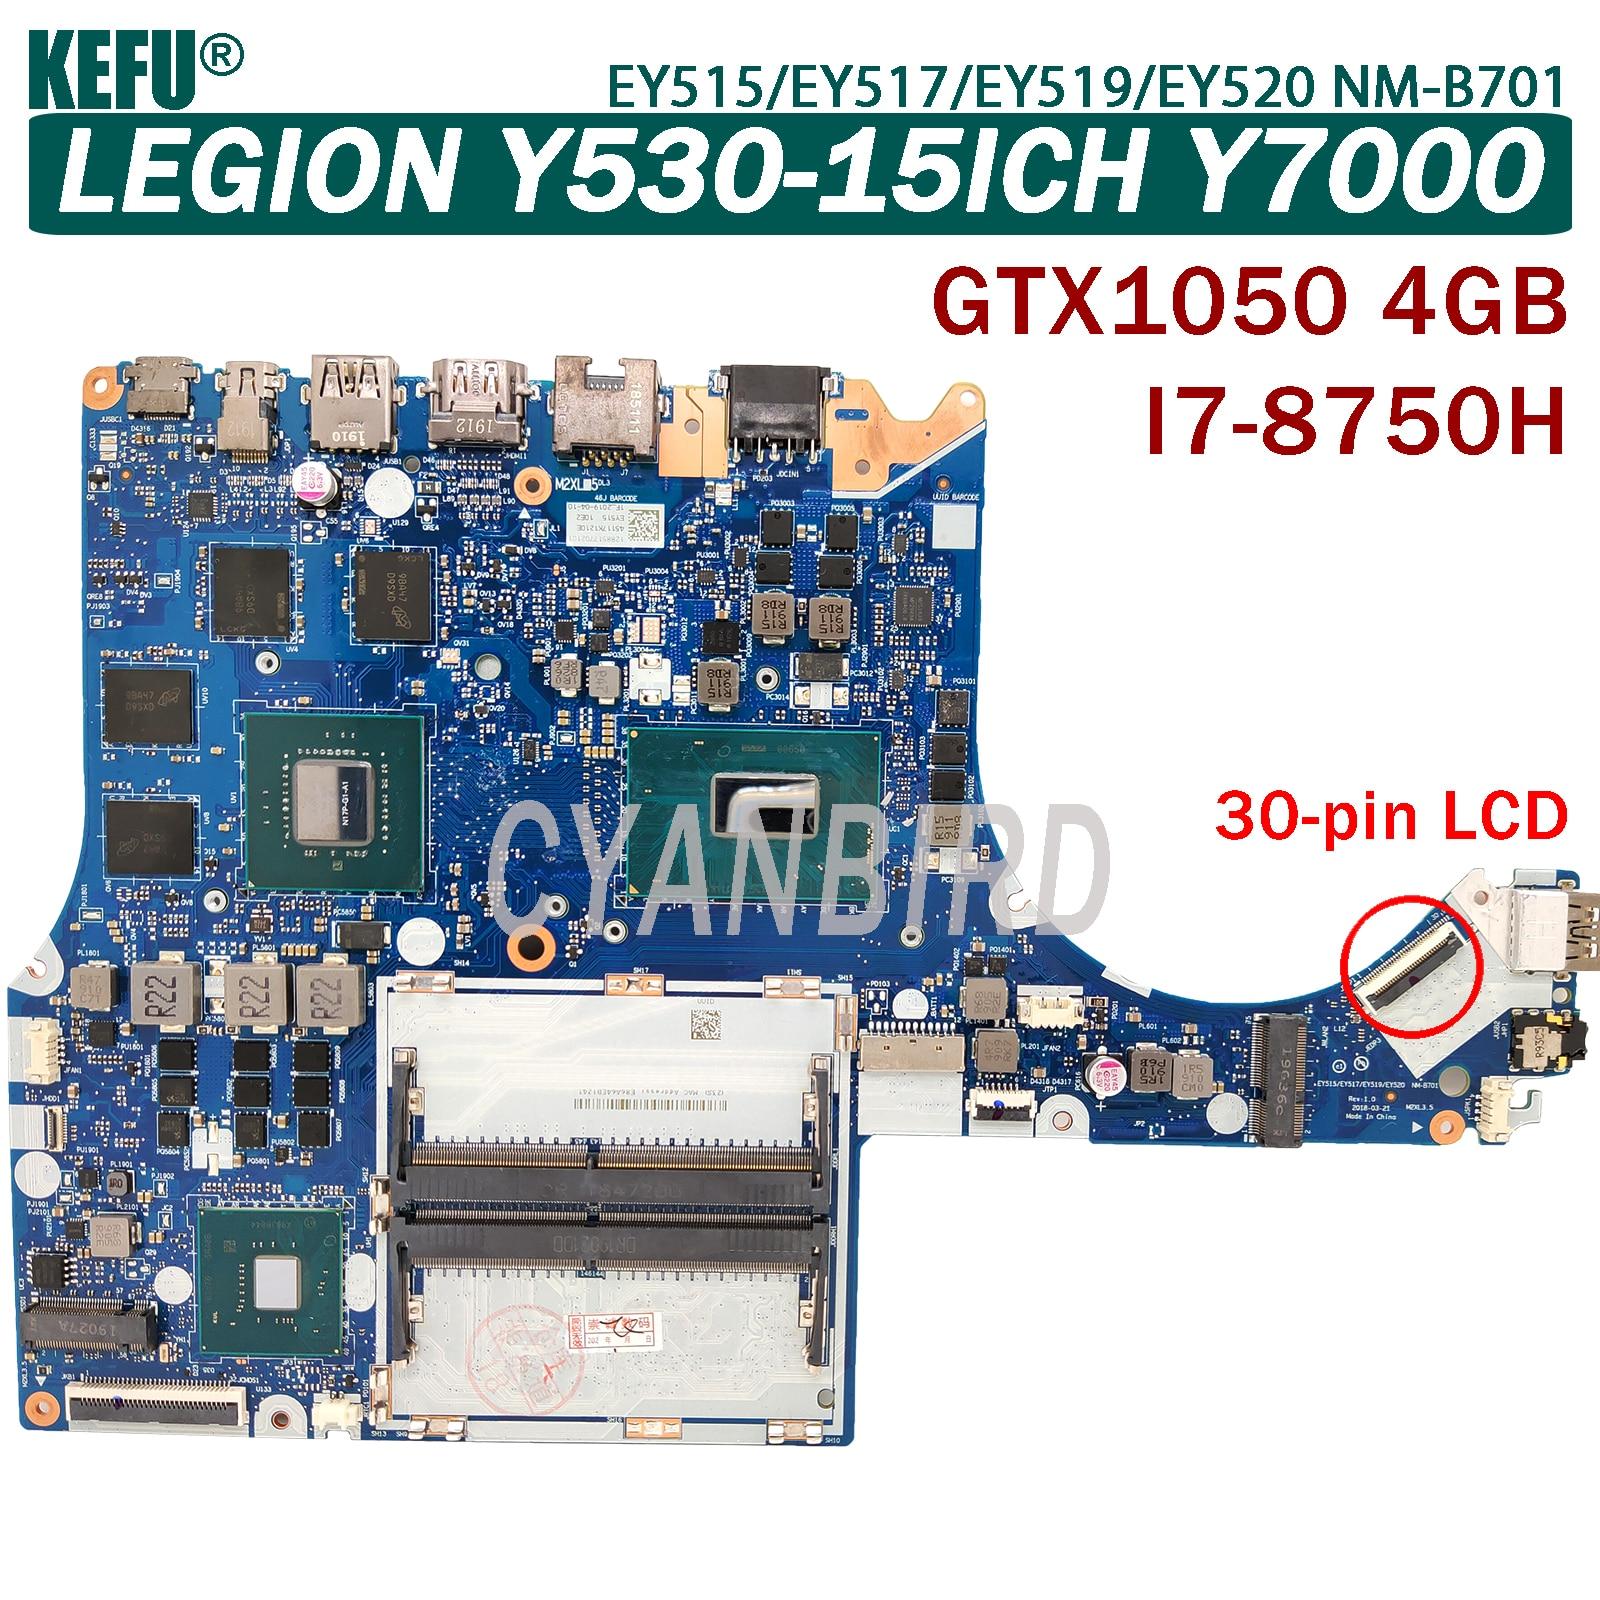 KEFU EY515/EY517/EY519/EY520 NM-B701 اللوحة الرئيسية الأصلية لينوفو Y530-15ICH Y7000 مع I7-8750H اللوحة الأم GTX1050-4GB